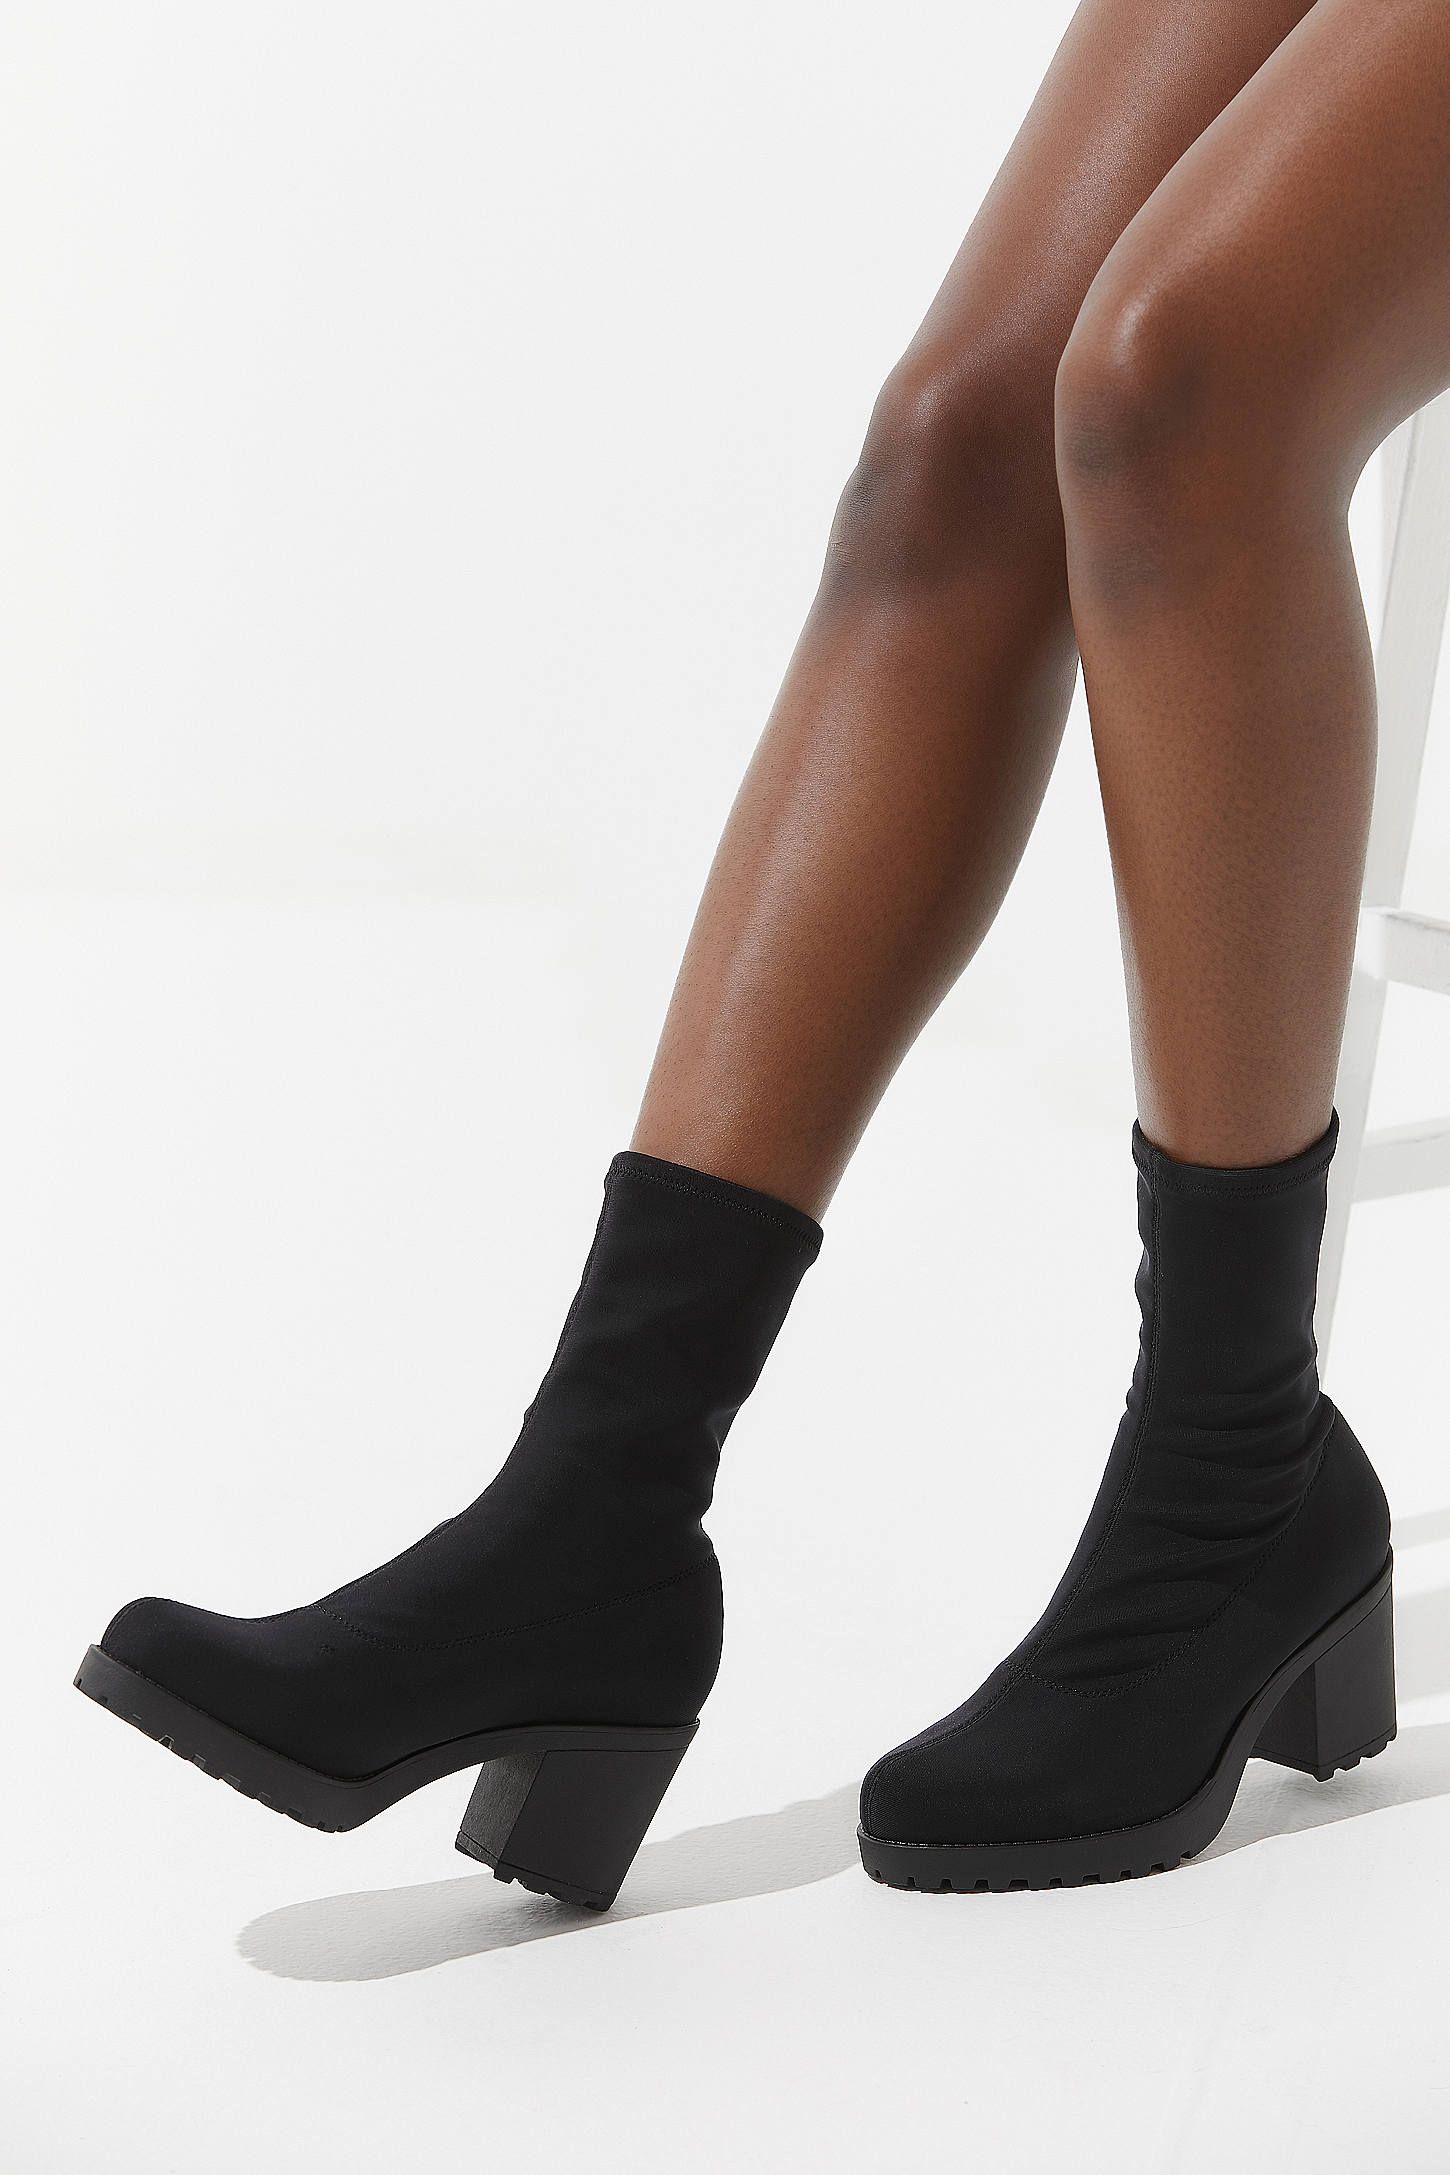 Vagabond Grace Glove Boot | Boots